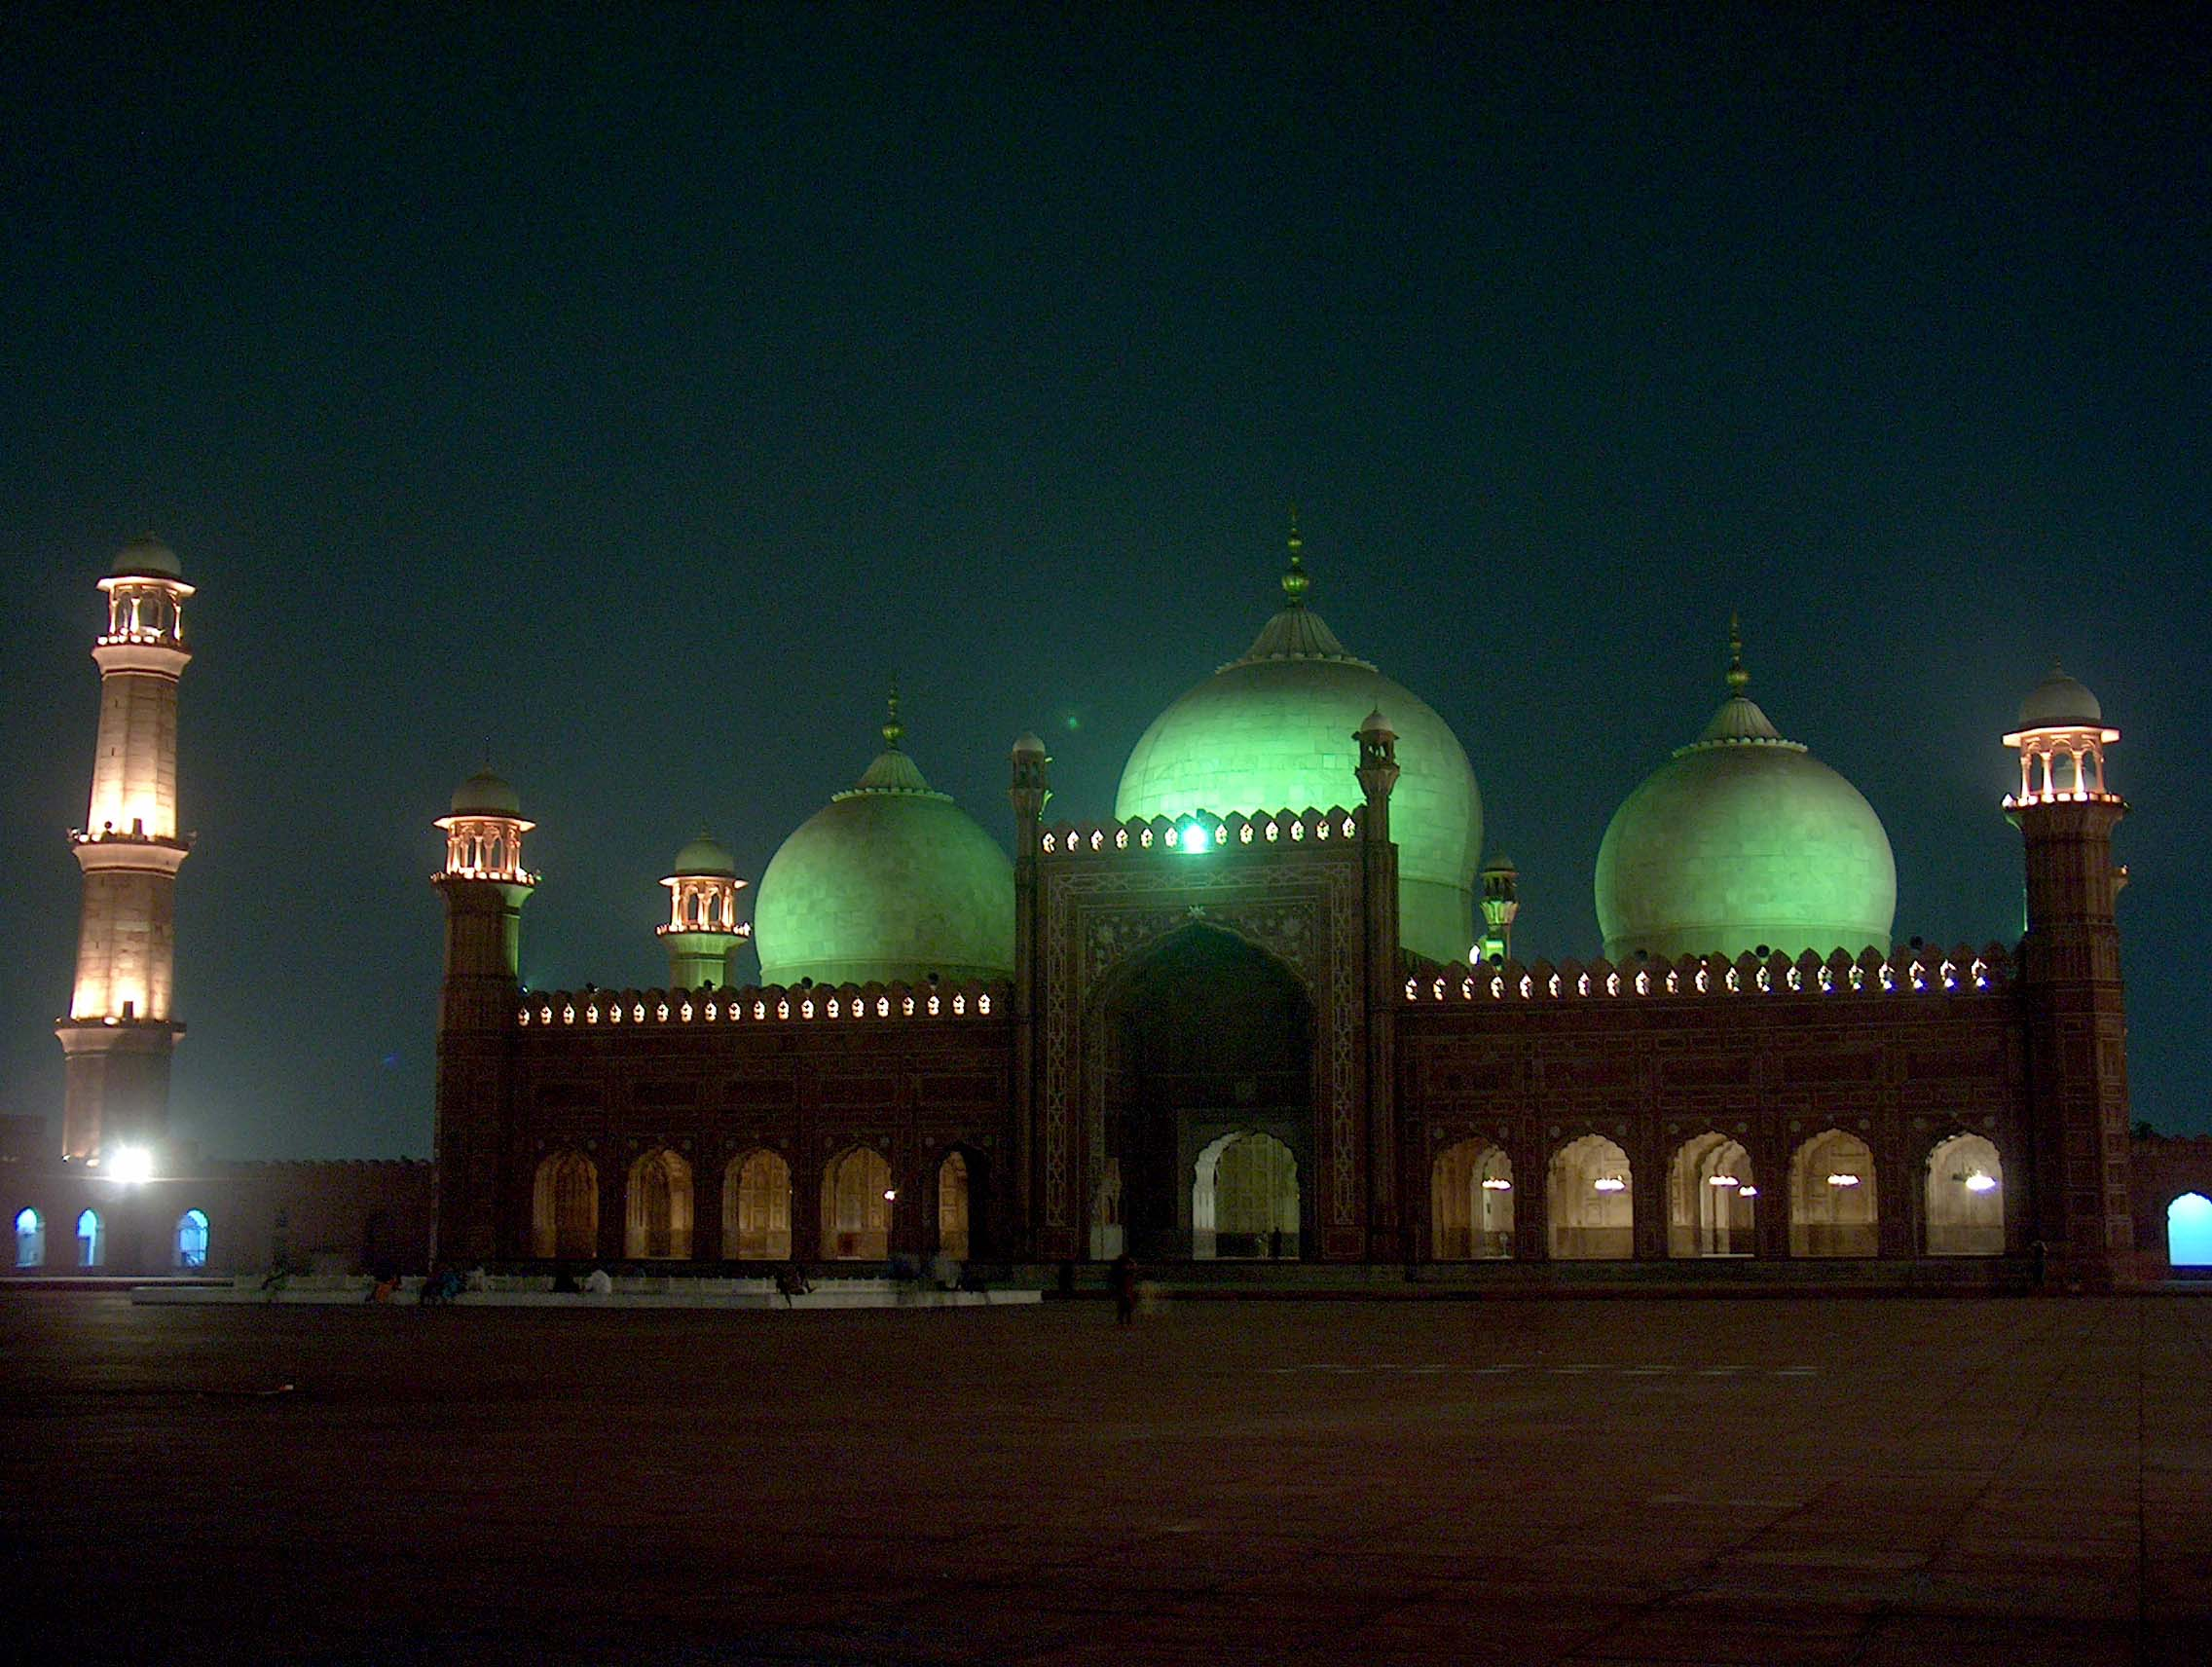 The 17th century Badshahi Mosque built by Mugh...